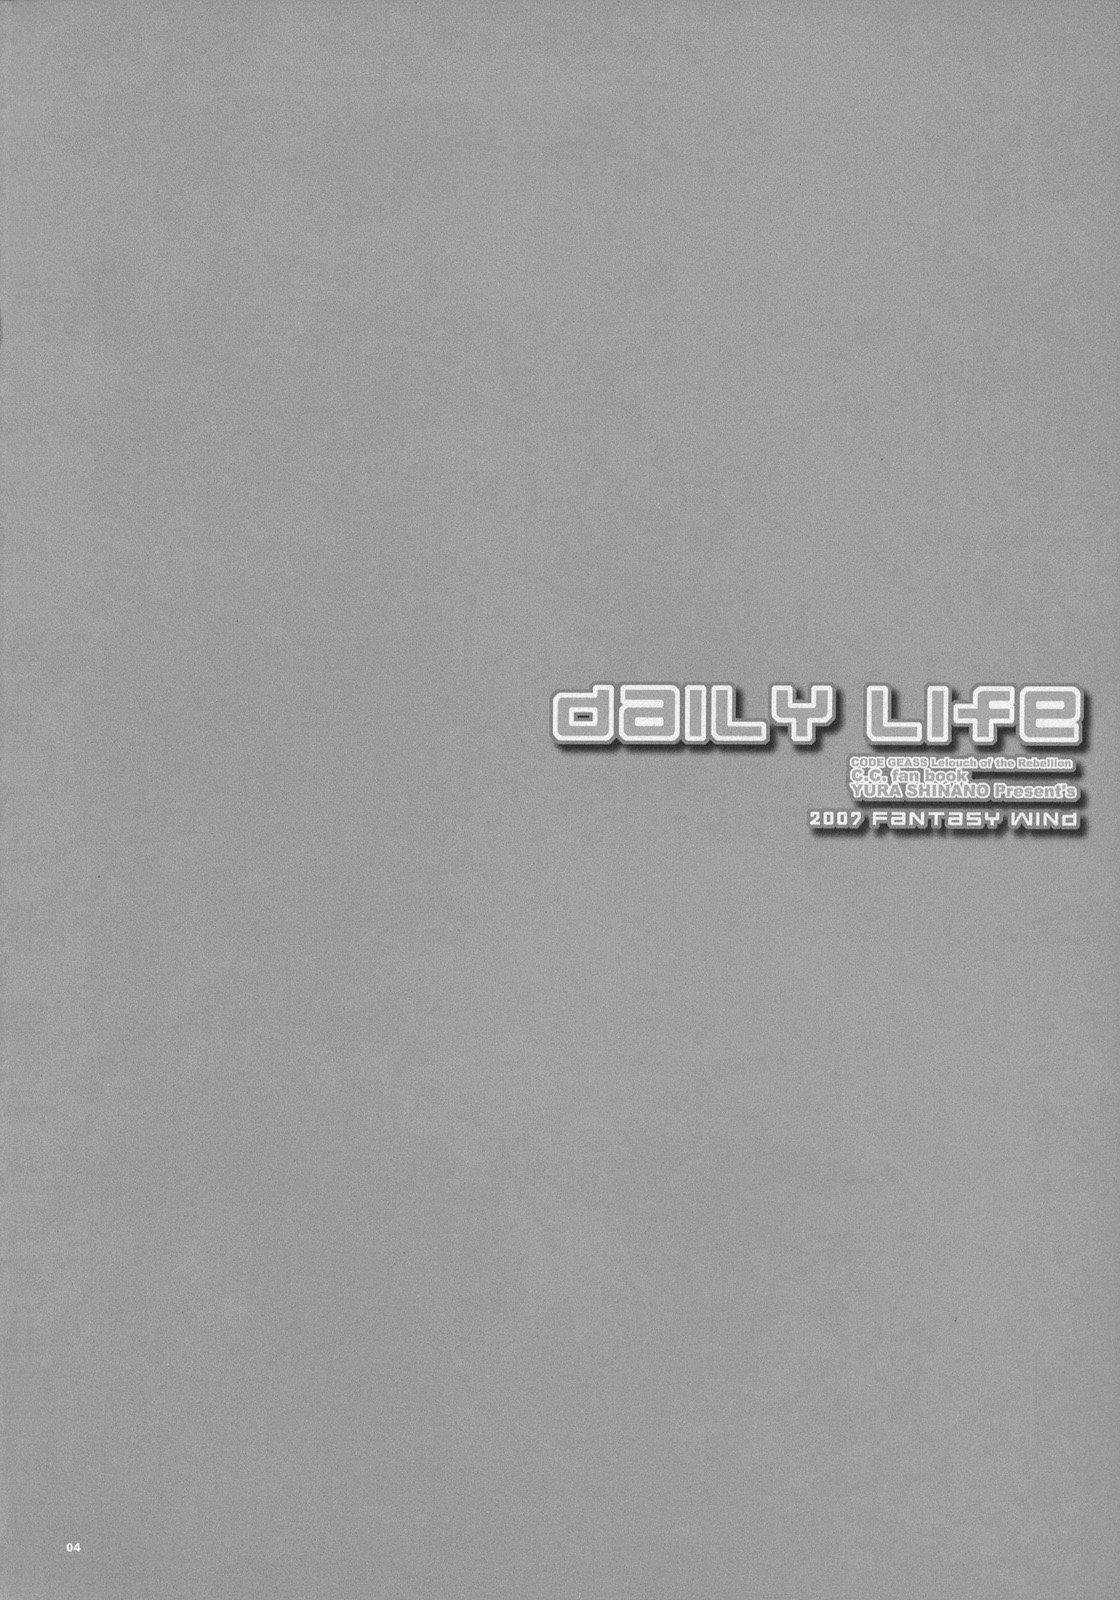 (C72) [FANTASY WIND (Shinano Yura)} Daily Life (Code Geass: Lelouch of the Rebellion) 2